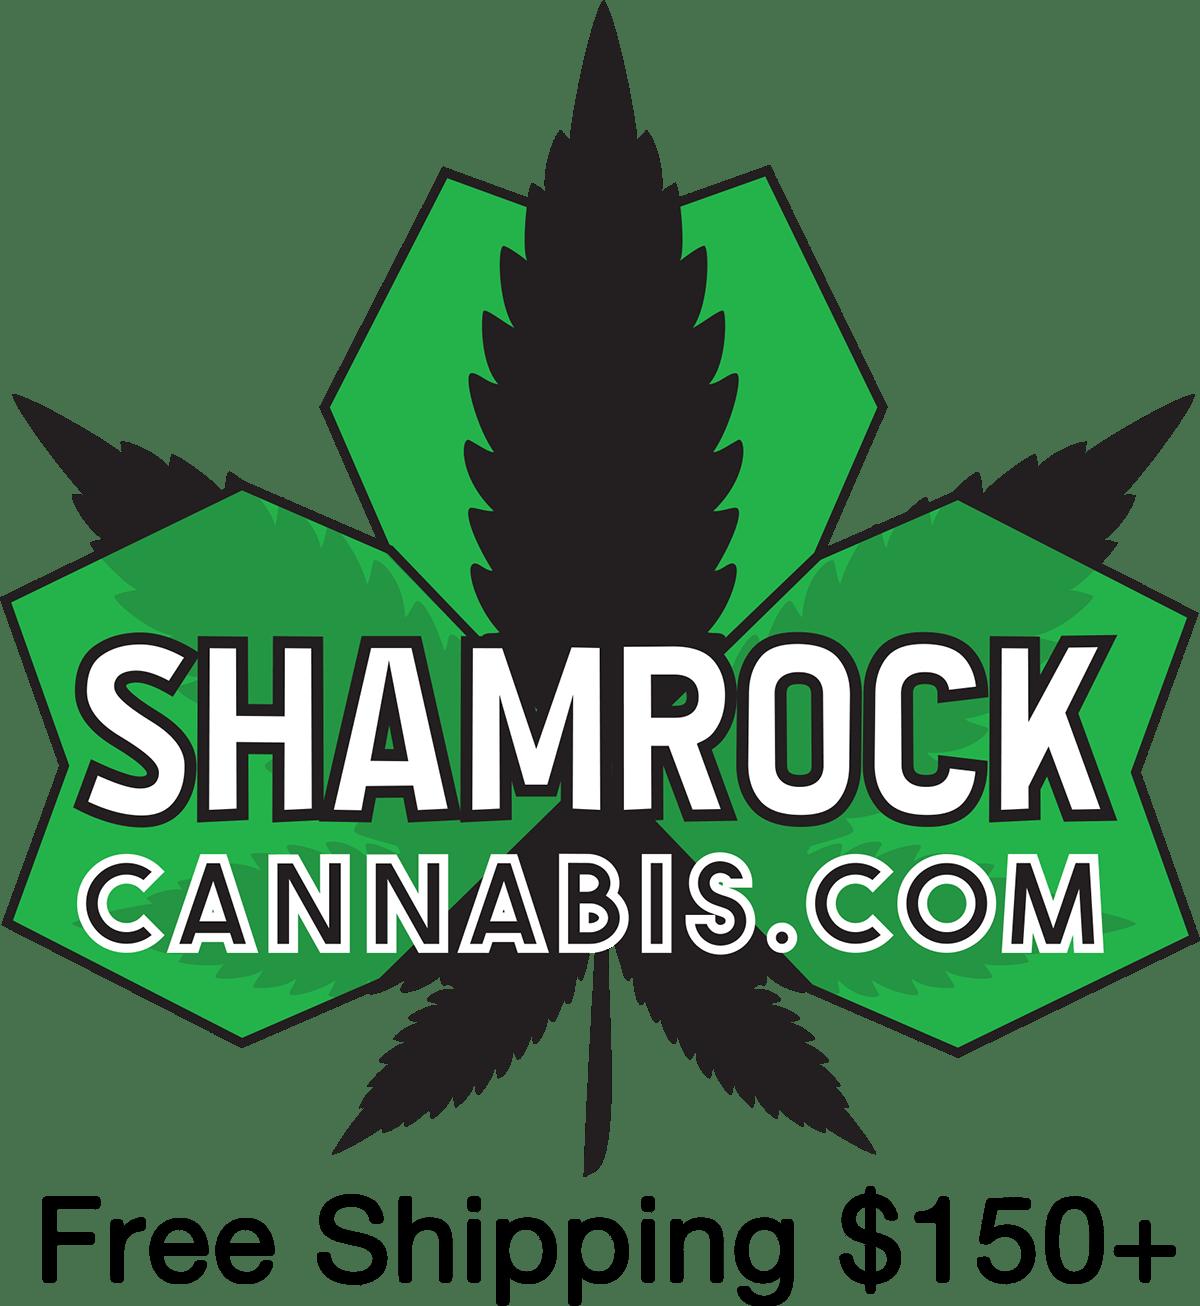 Shamrock Cannabis